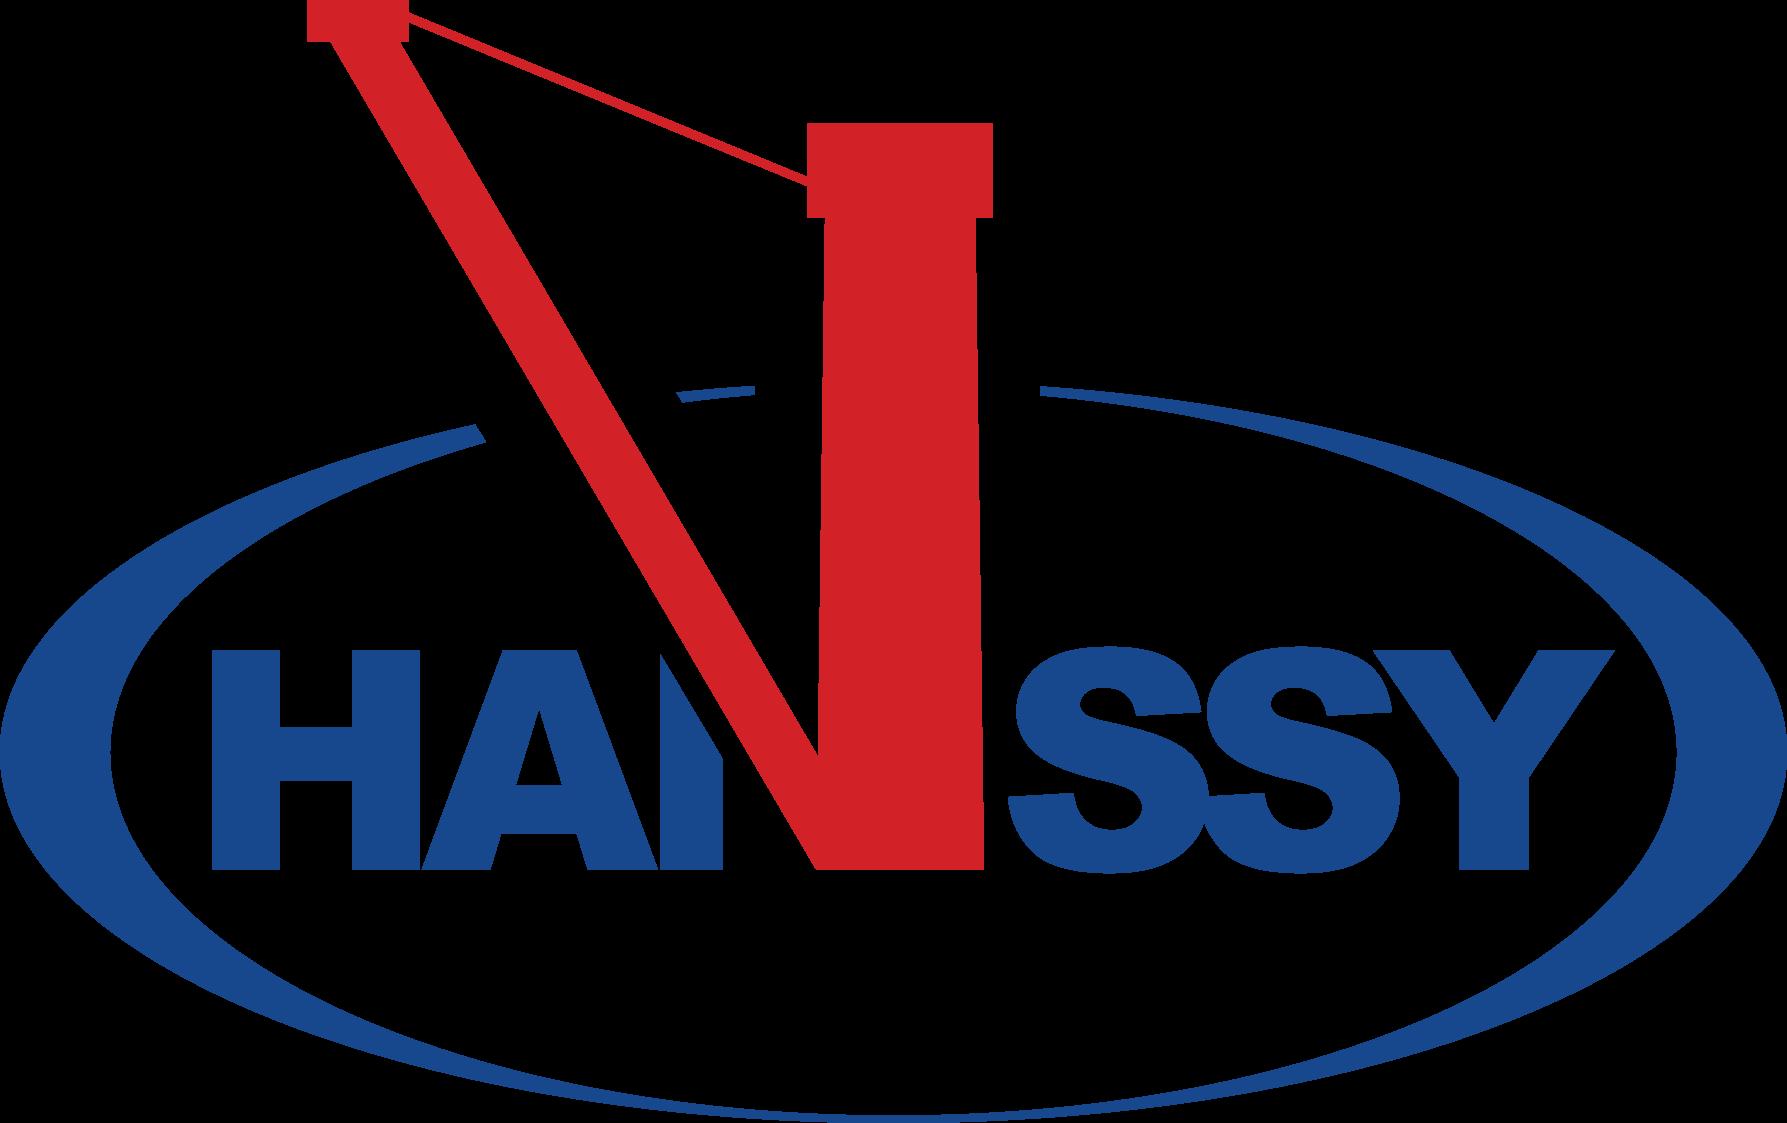 Hanssy Shipping Pte Ltd